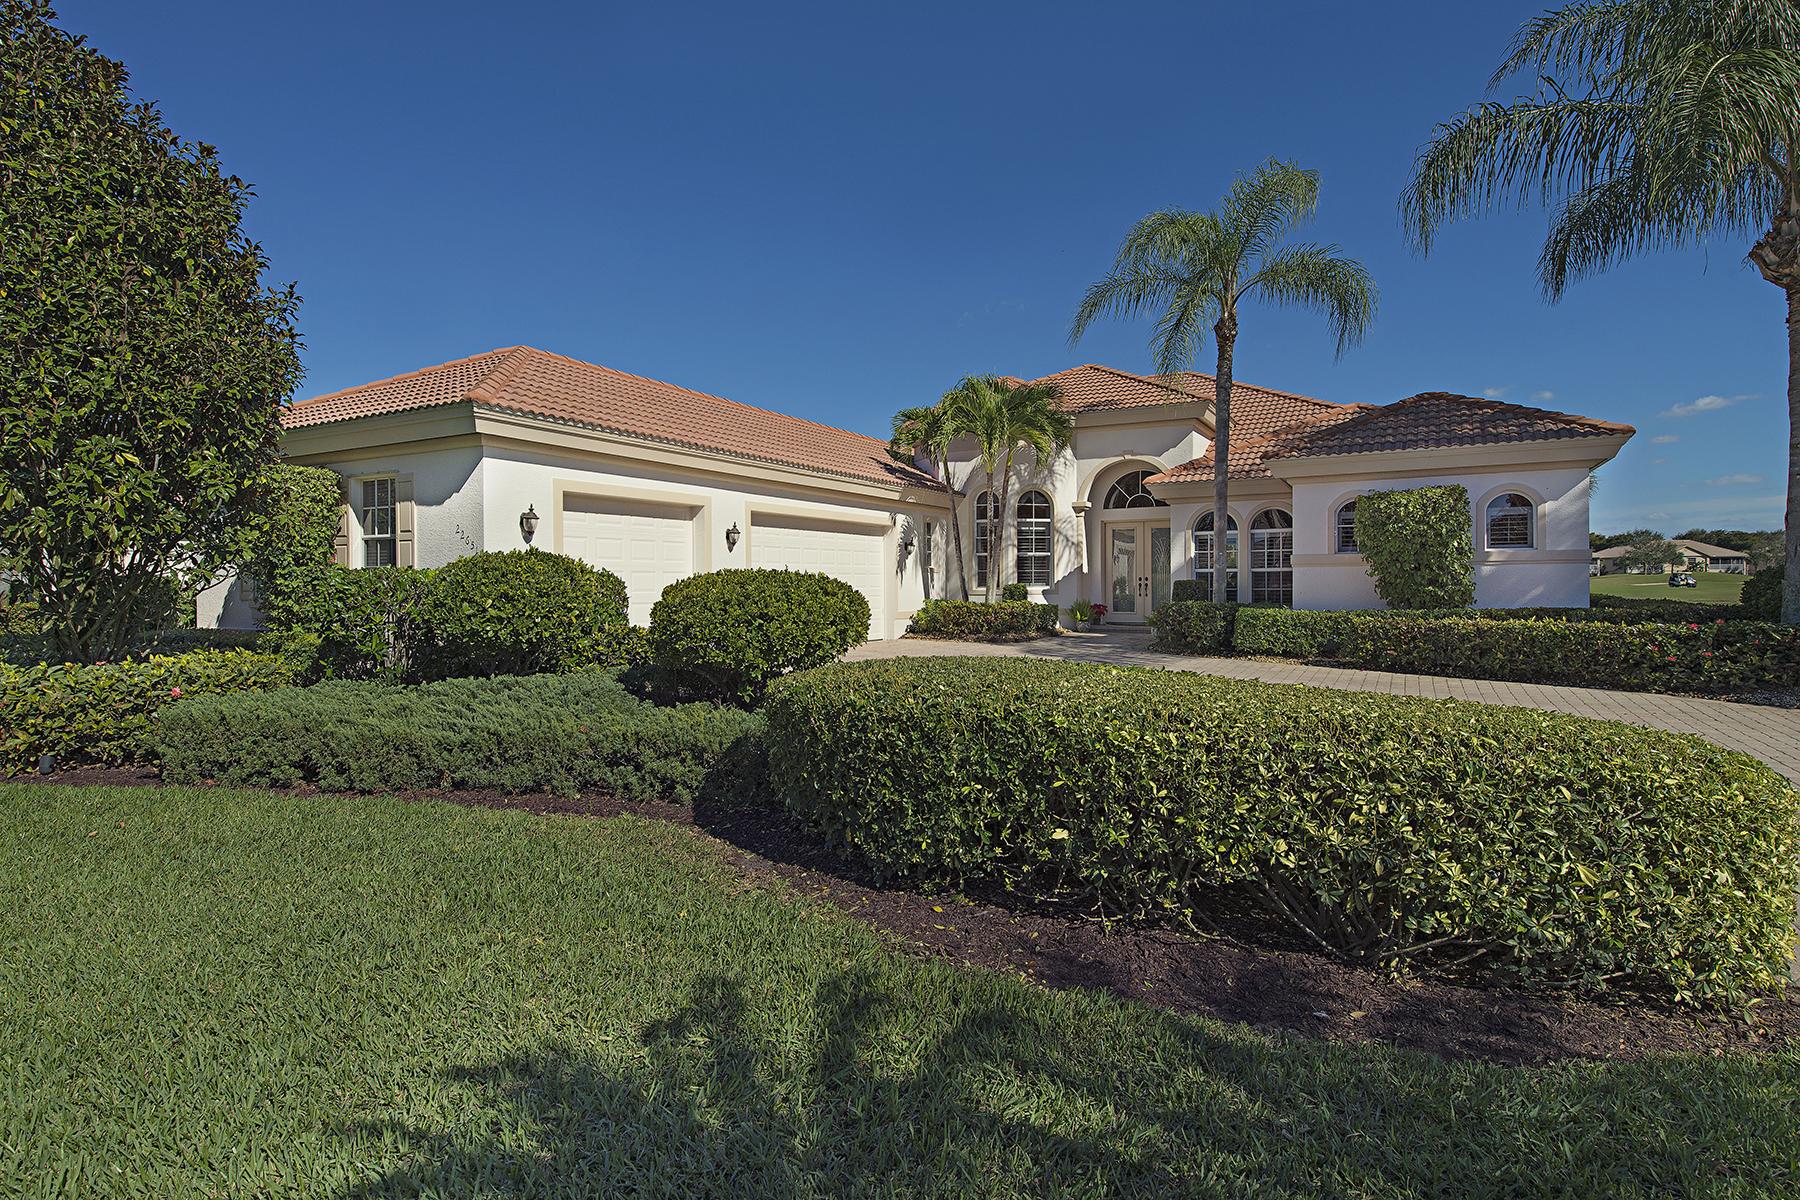 Casa para uma família para Venda às SHADOWWOOD -WOODMONT 22651 Fairlawn Ct Estero, Florida 34135 Estados Unidos